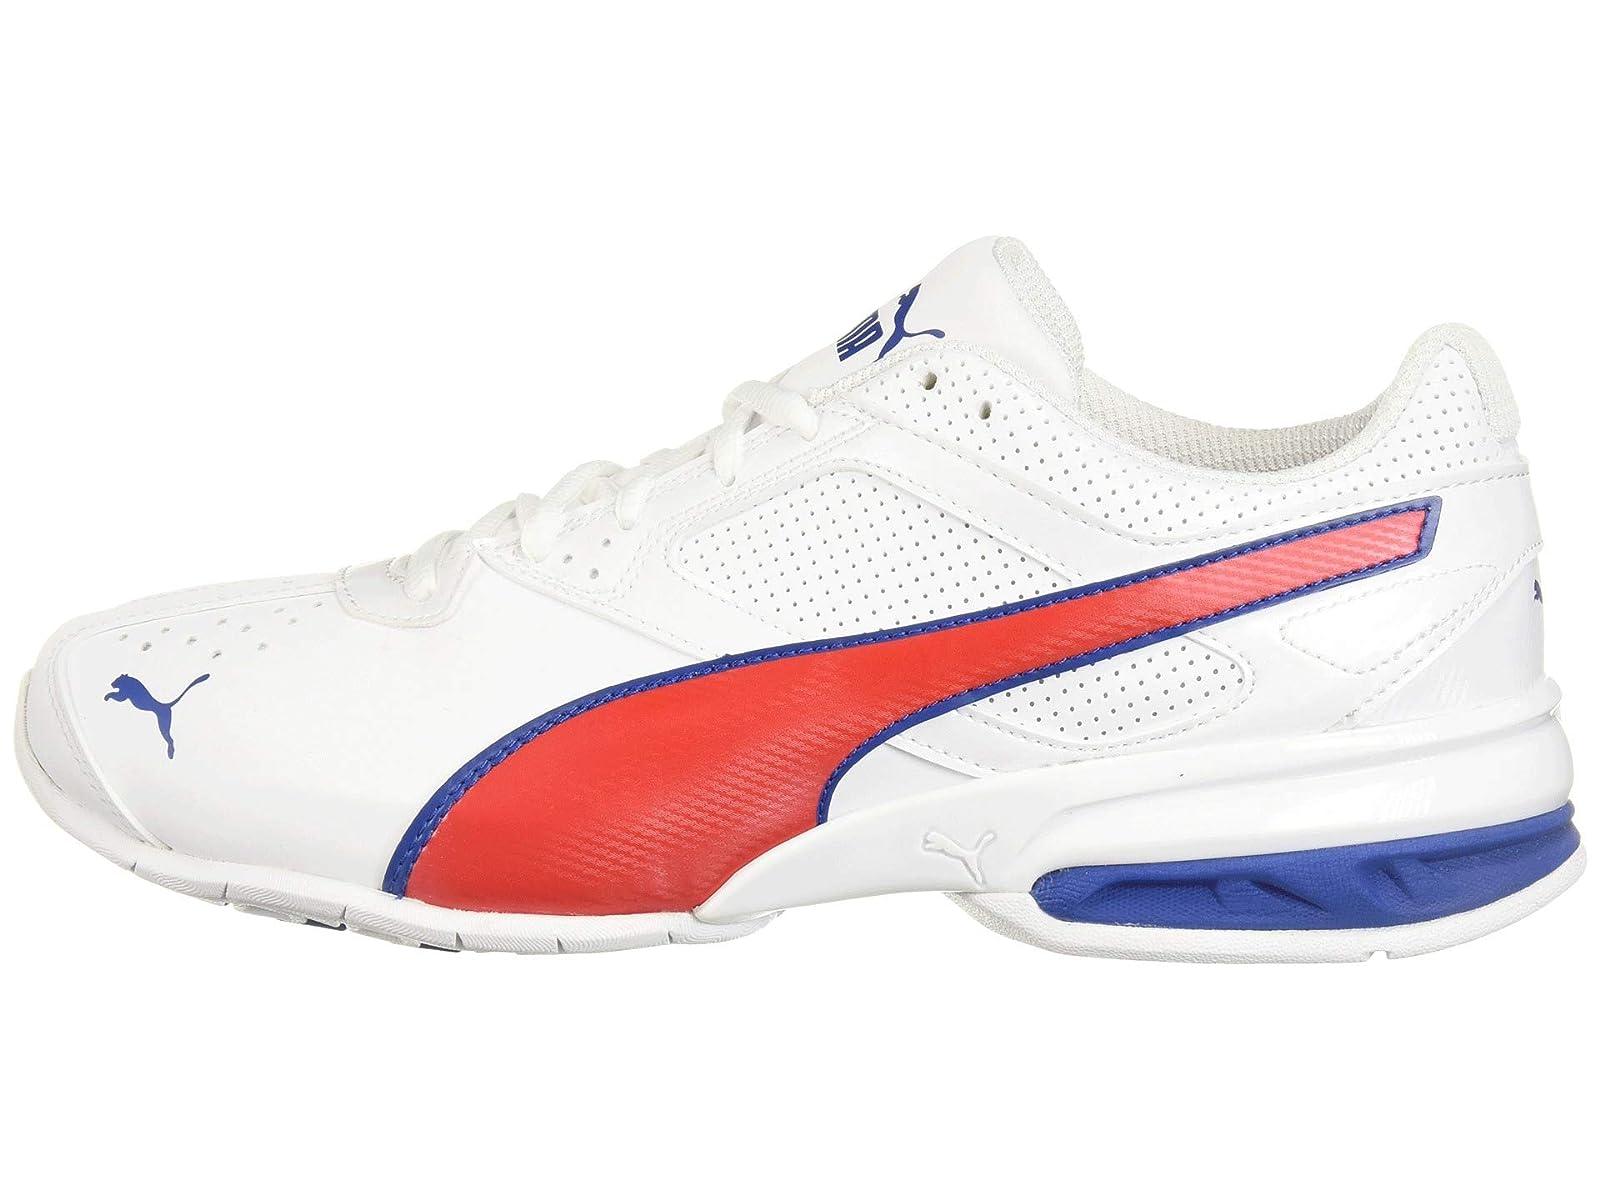 Men-039-s-Scarpe-Da-Ginnastica-amp-Athletic-Shoes-Puma-Tazon-6-FM miniatura 12